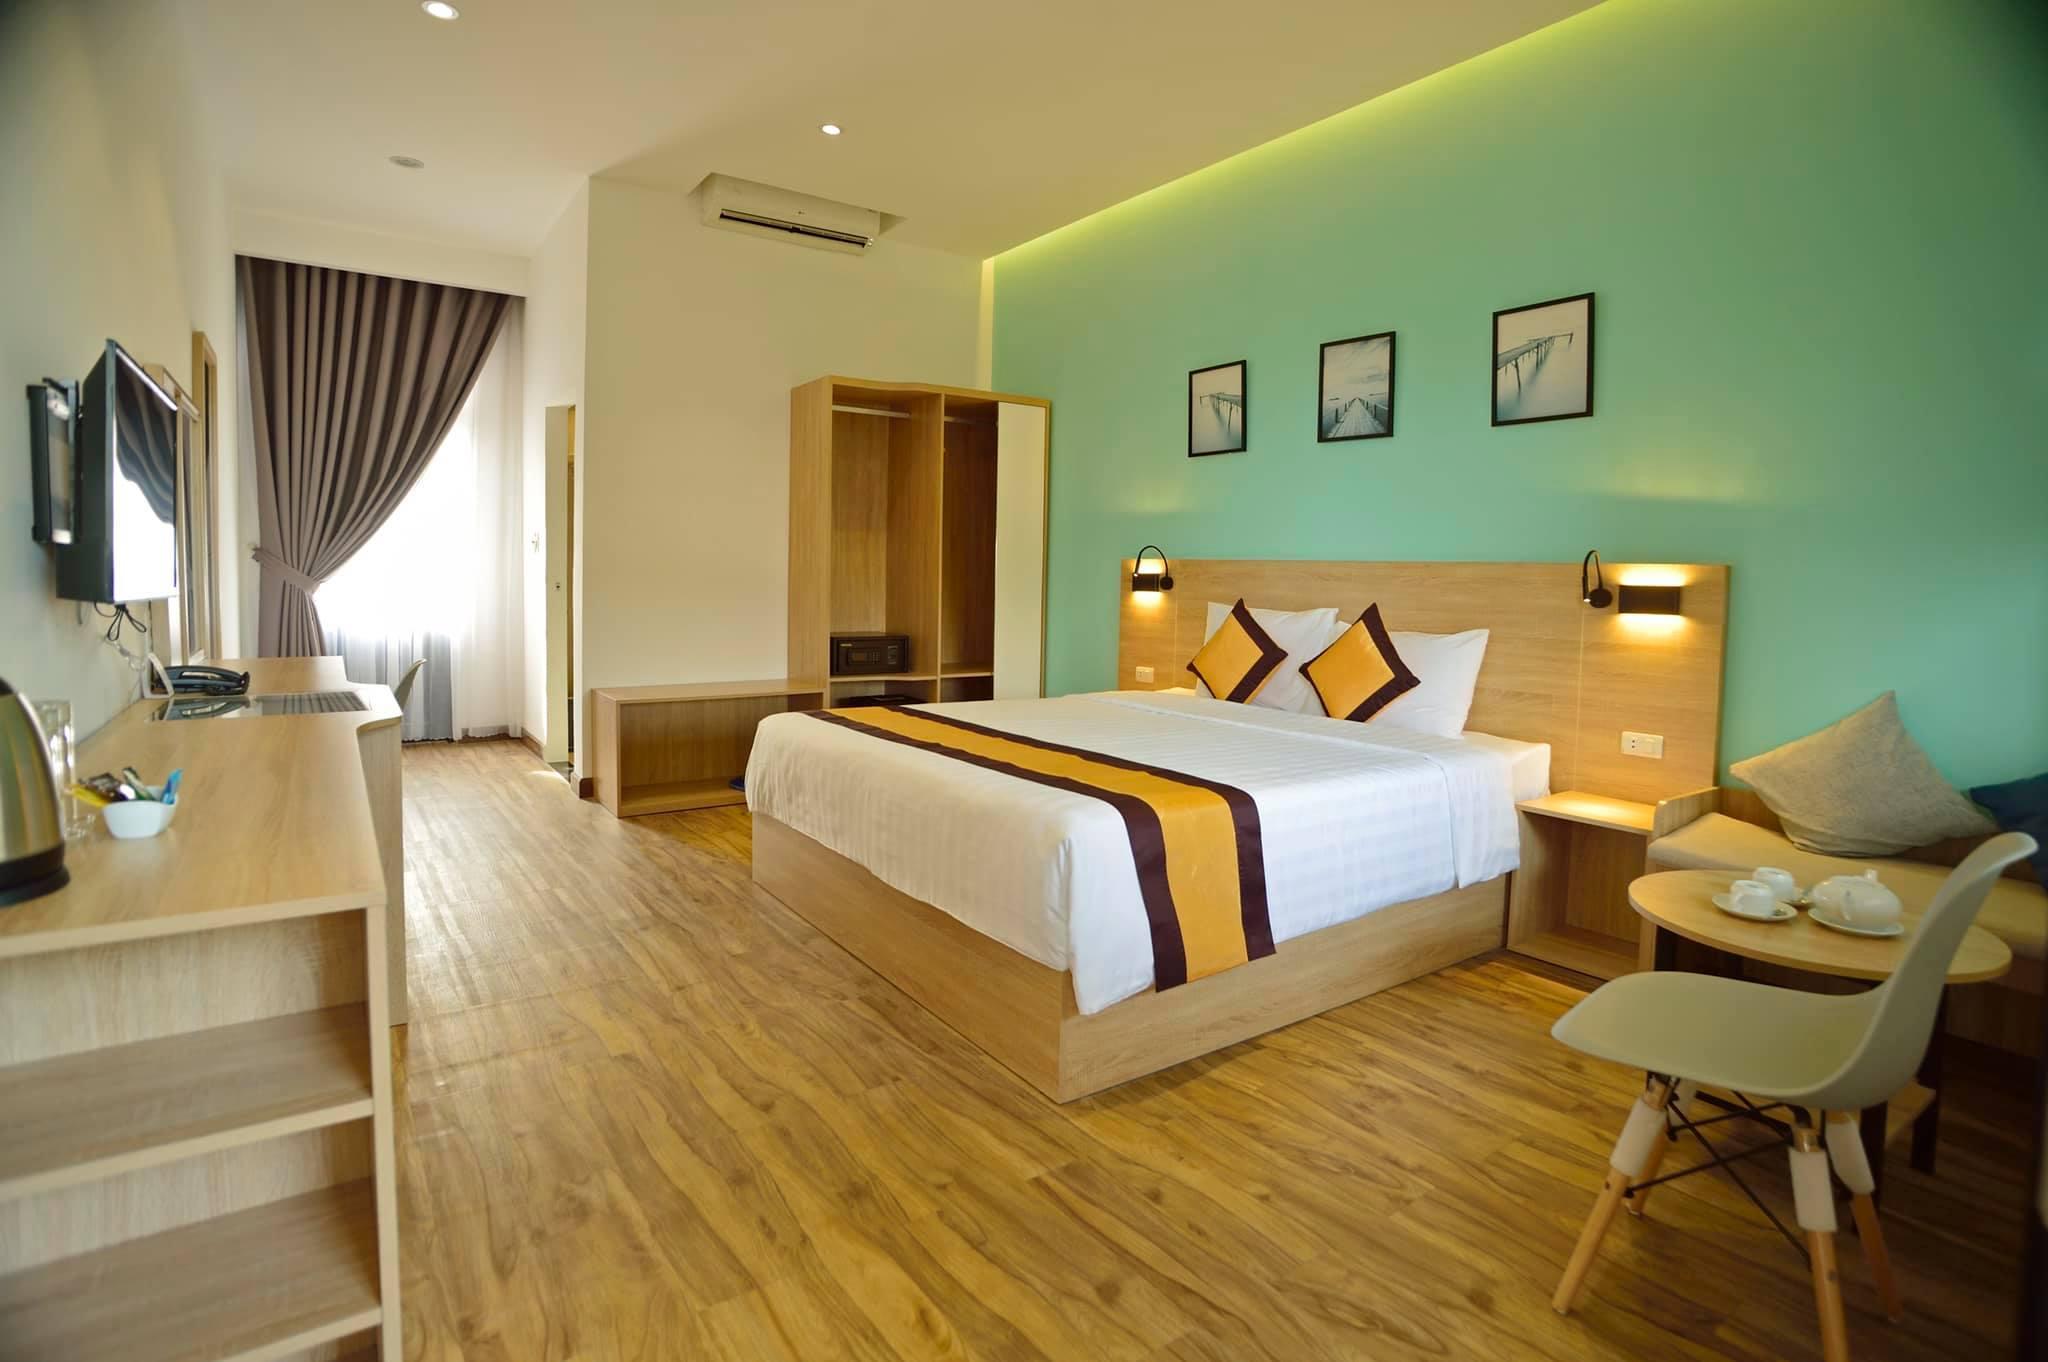 pandora-hotel-reivew